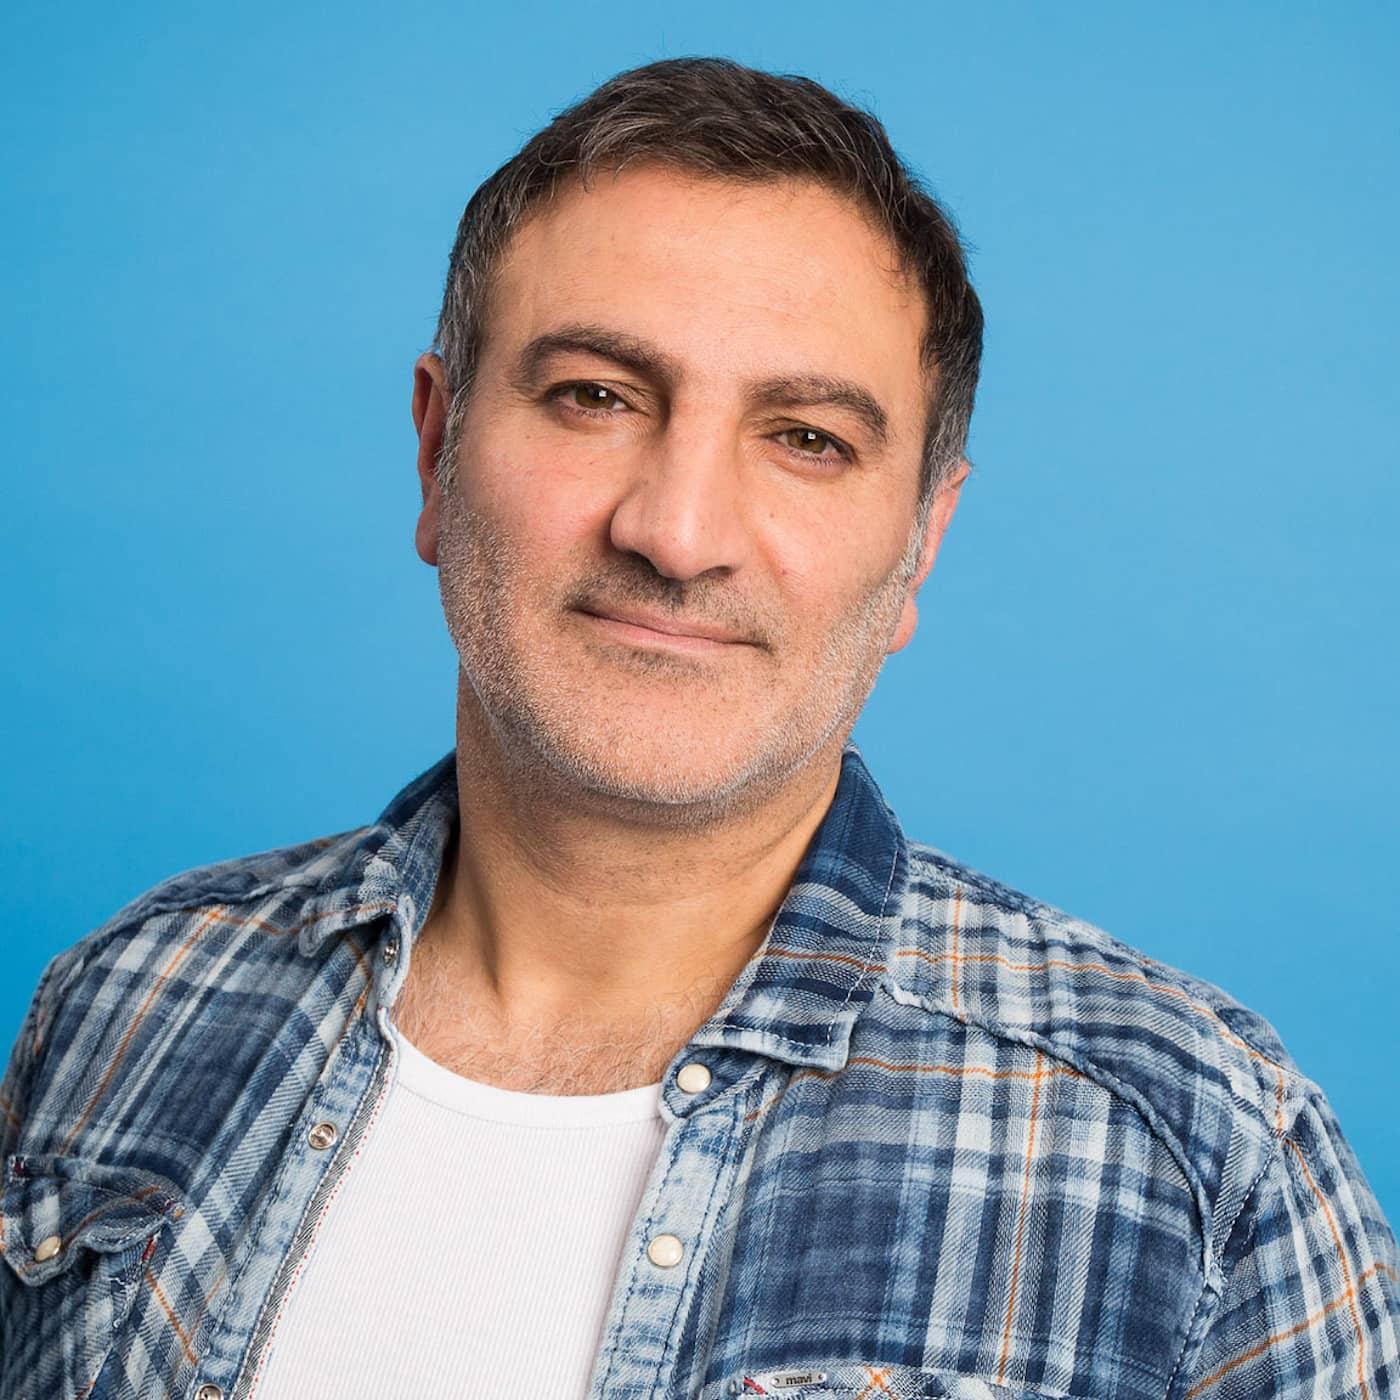 Mustafa Can - Vinter 2014